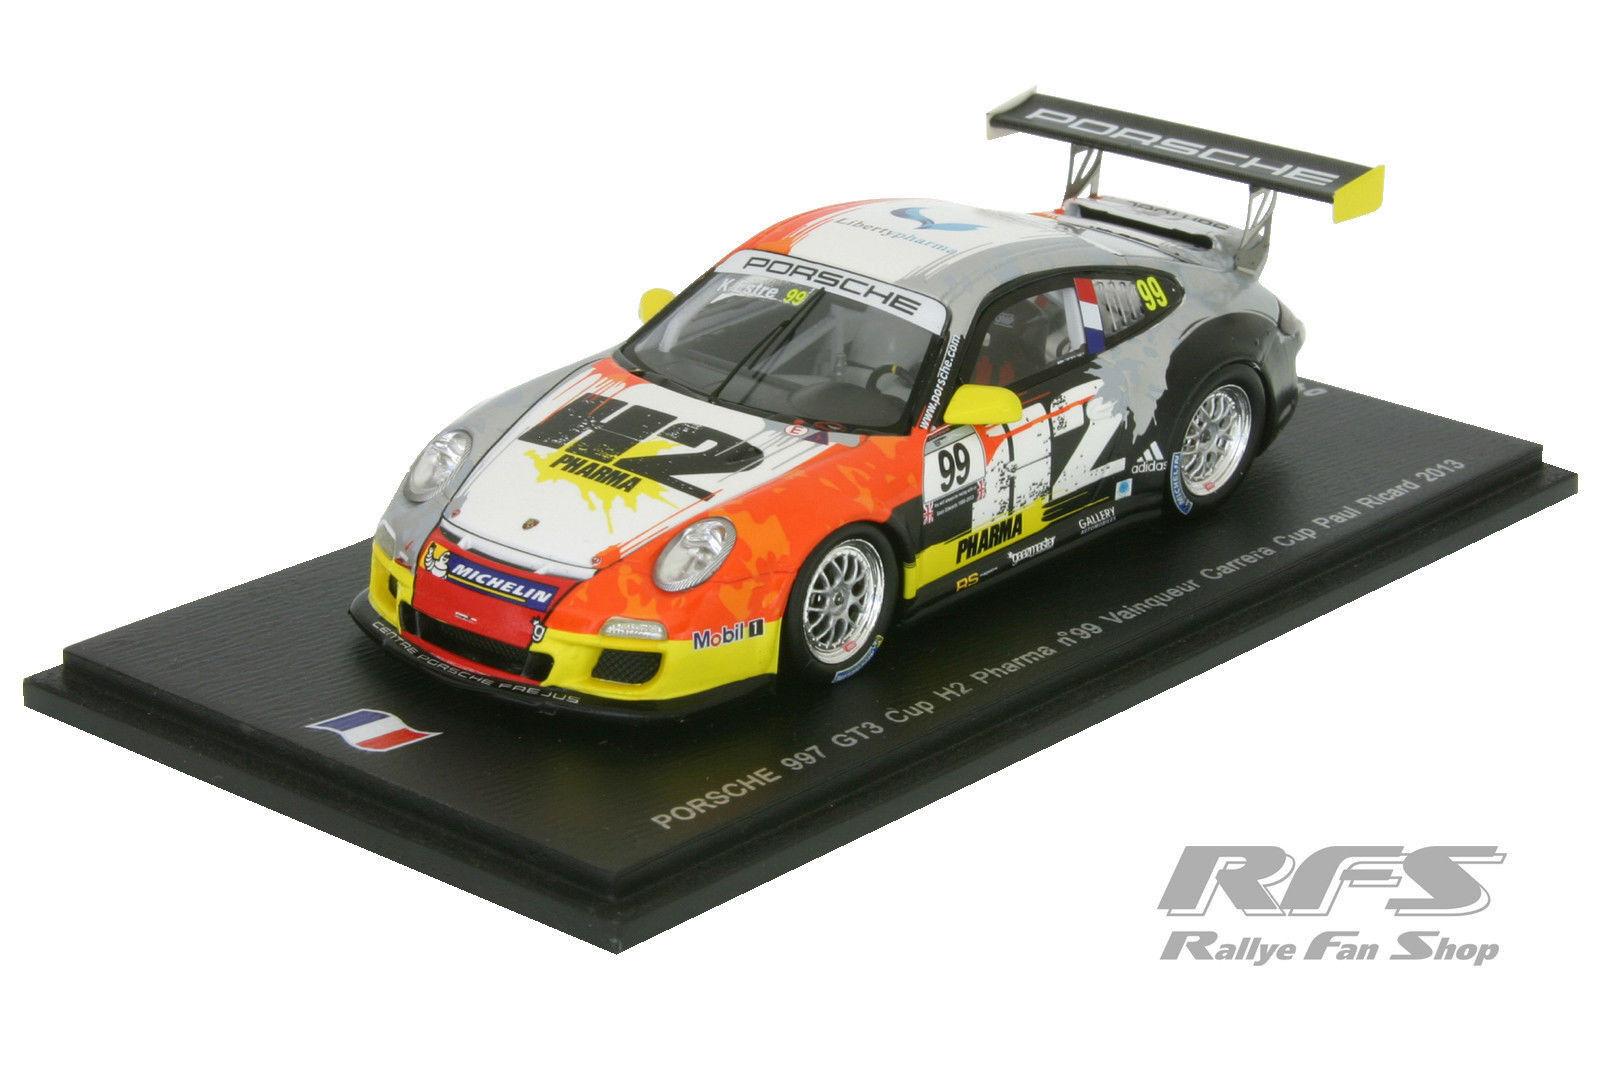 Porsche 997 gt3 Cup Team attempo Racing Estre-Carrera Cup 2013 1 43 Spark